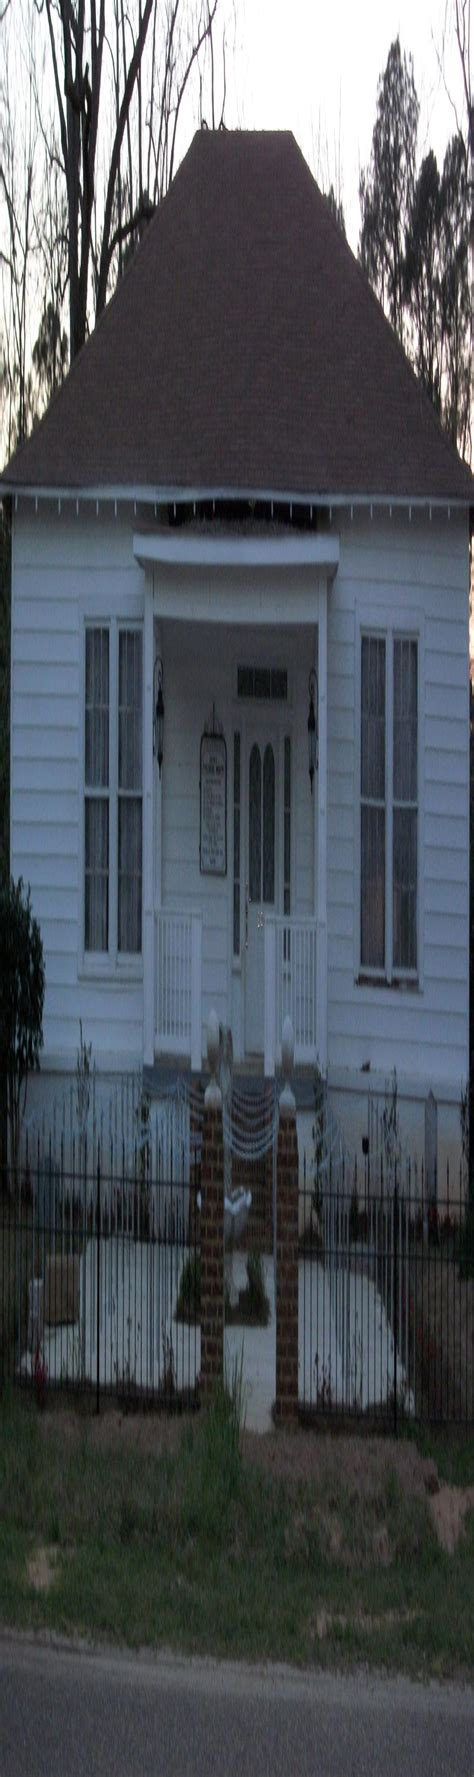 best haunted houses in alabama alabama haunted houses find haunted houses in alabama scariest and best www